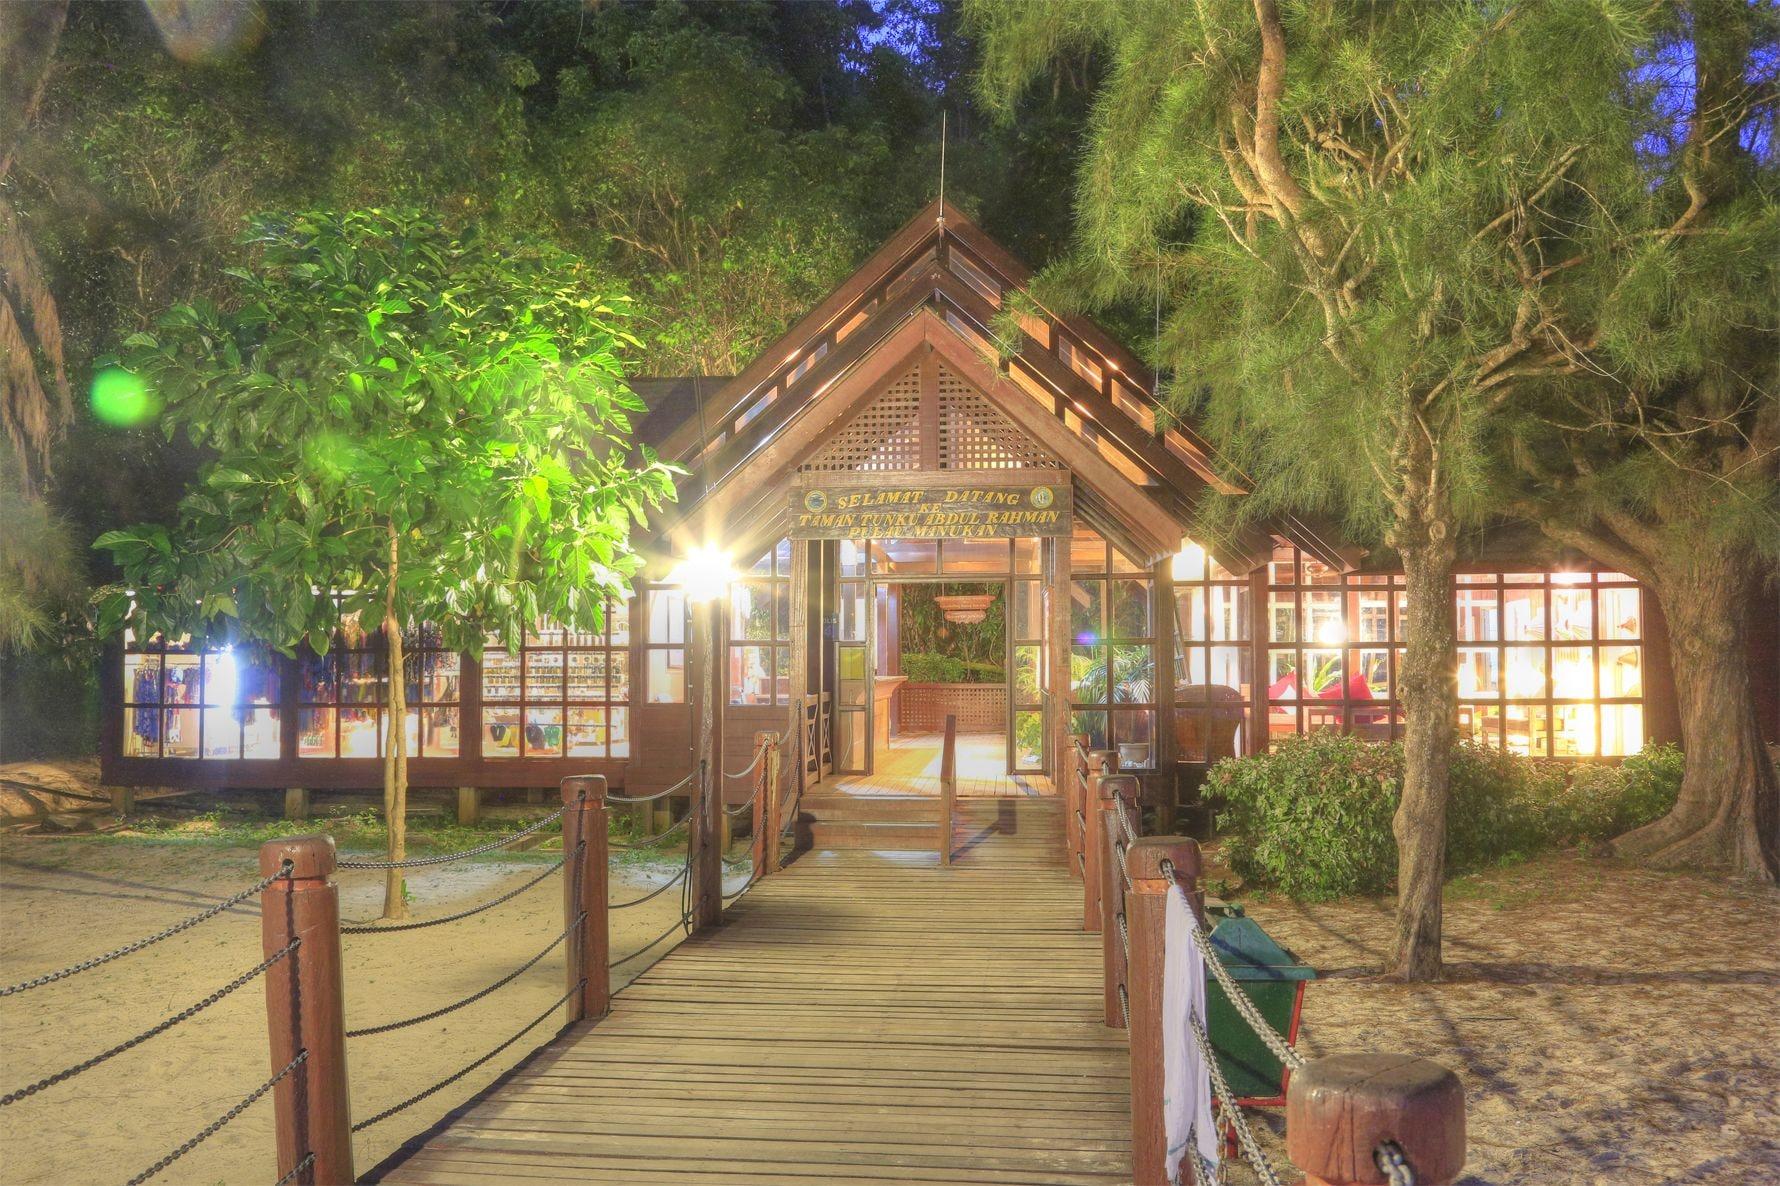 Sutera Sanctuary Lodges at Manukan Island, Kota Kinabalu